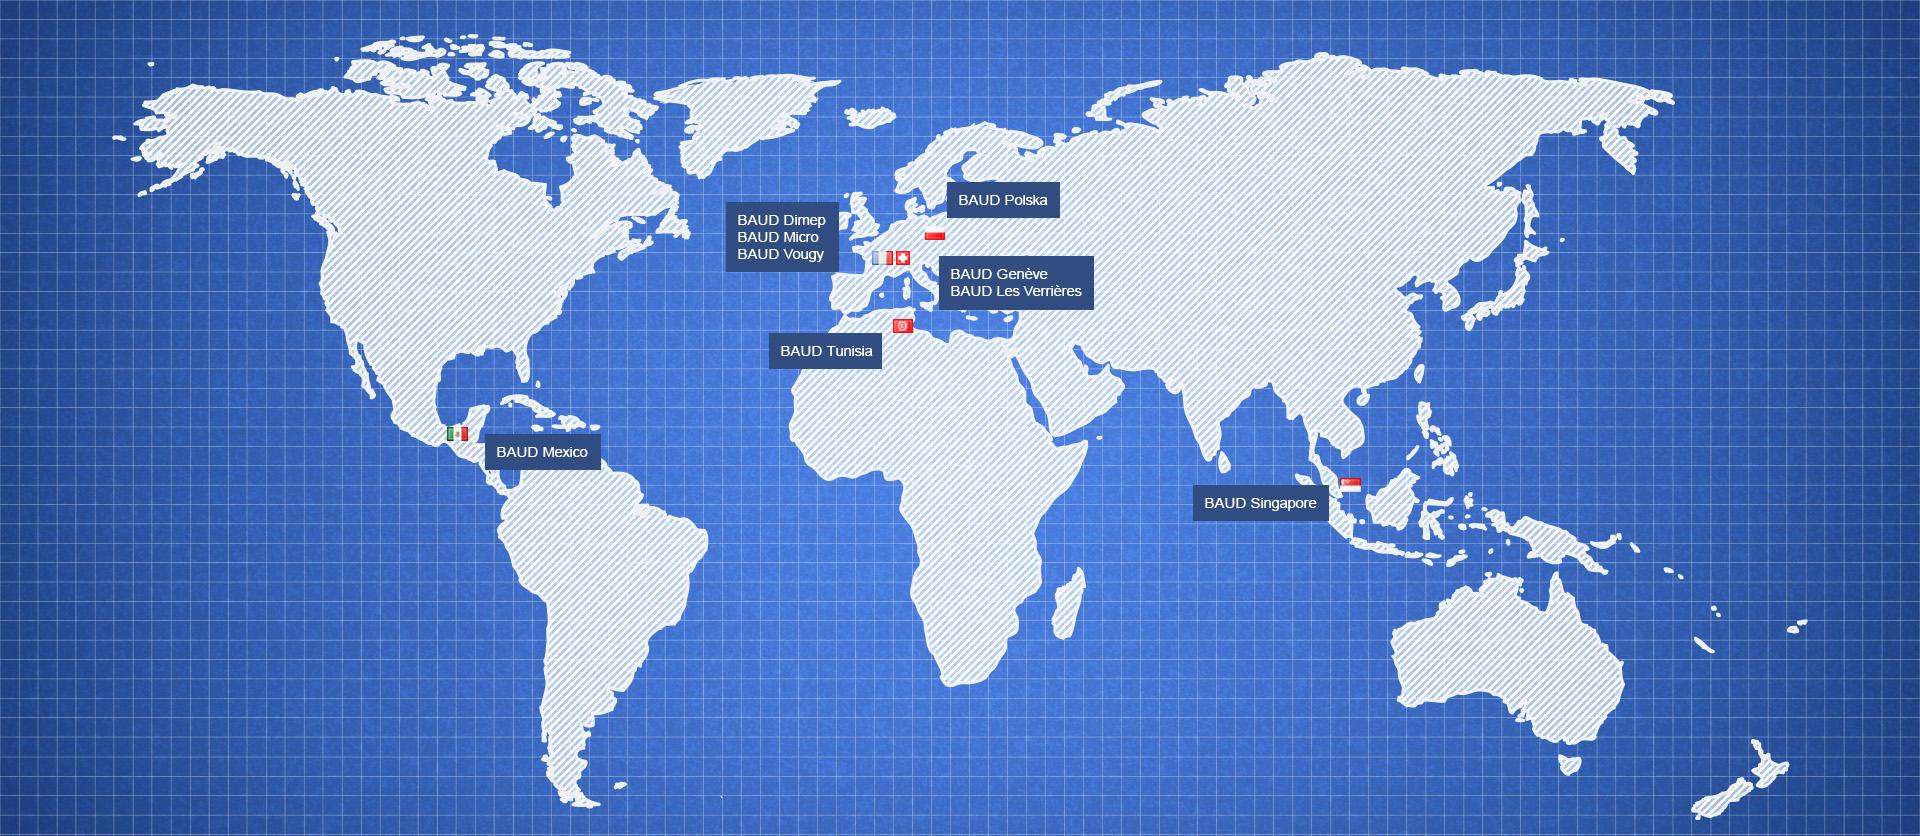 BAUD Industries   World Map - BAUD Industries